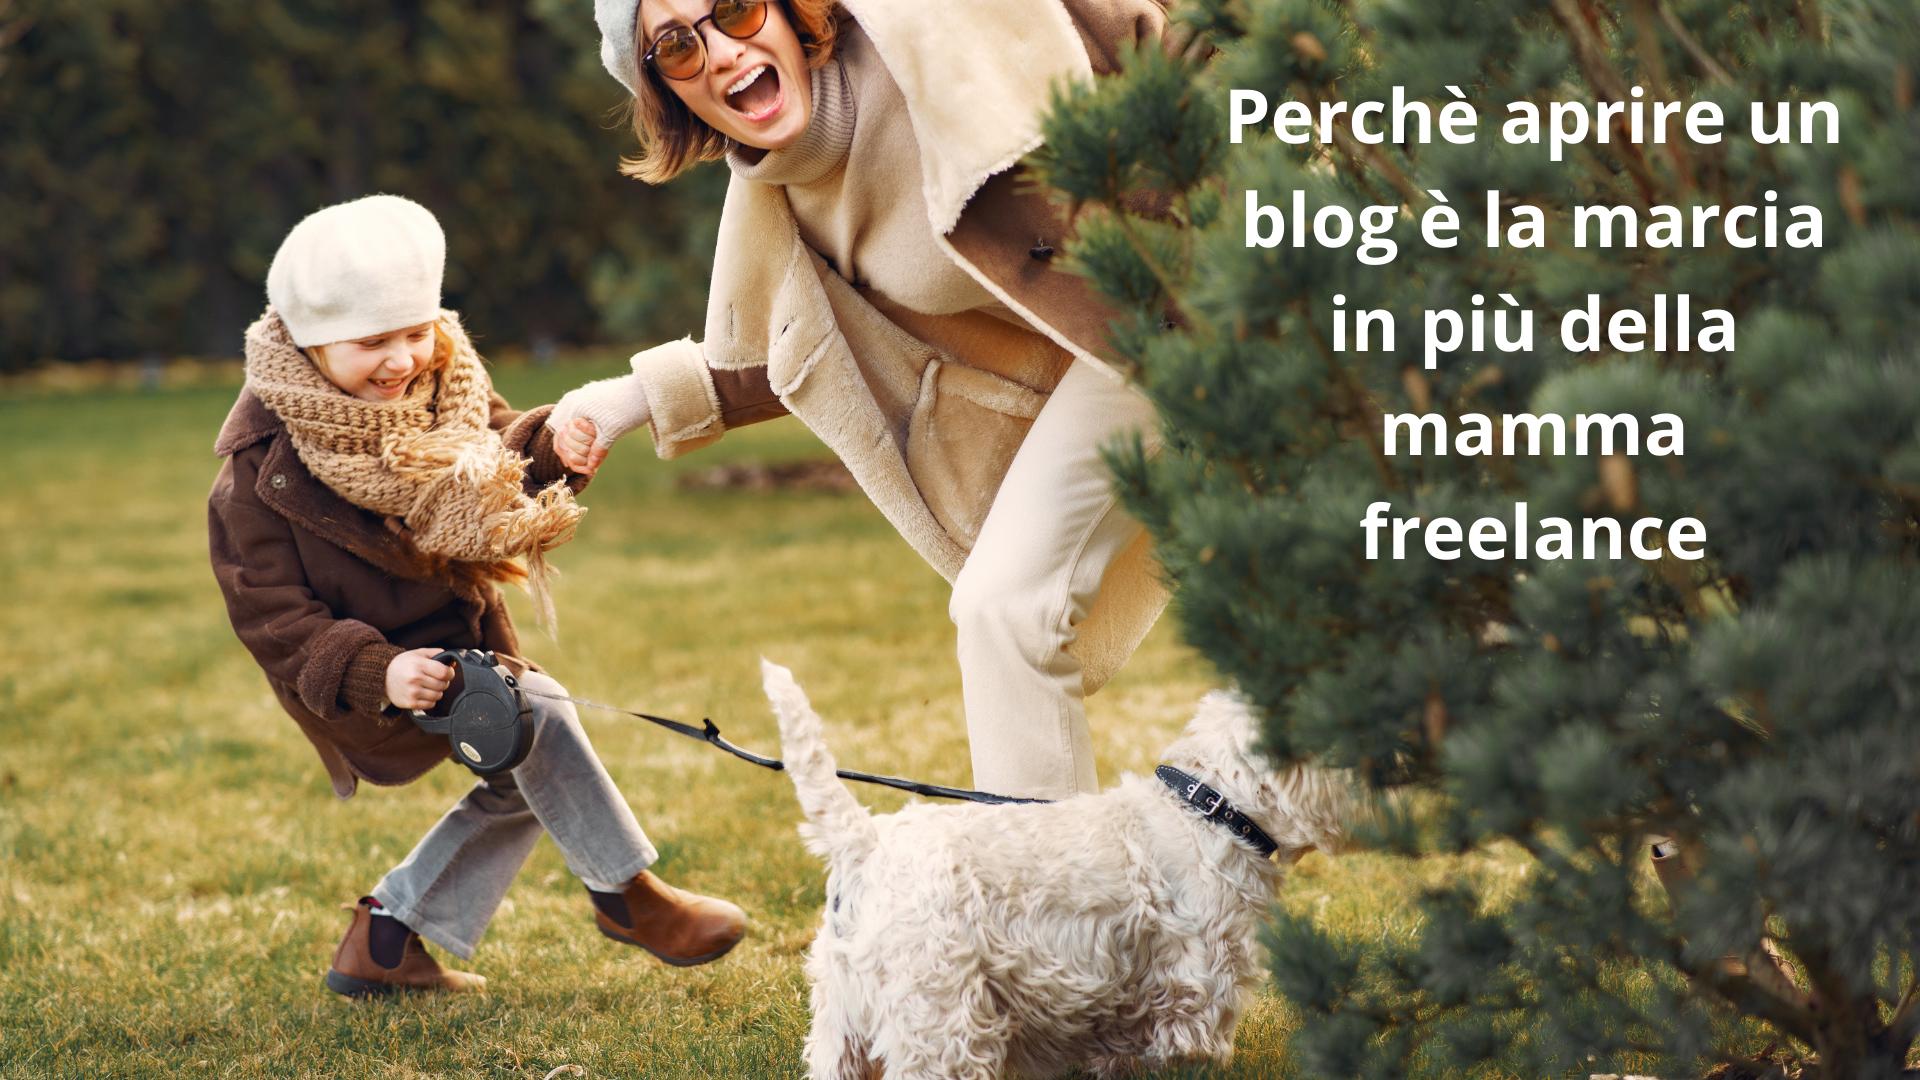 Mamma freelance, perché aprire un blog ti dà una marcia in più